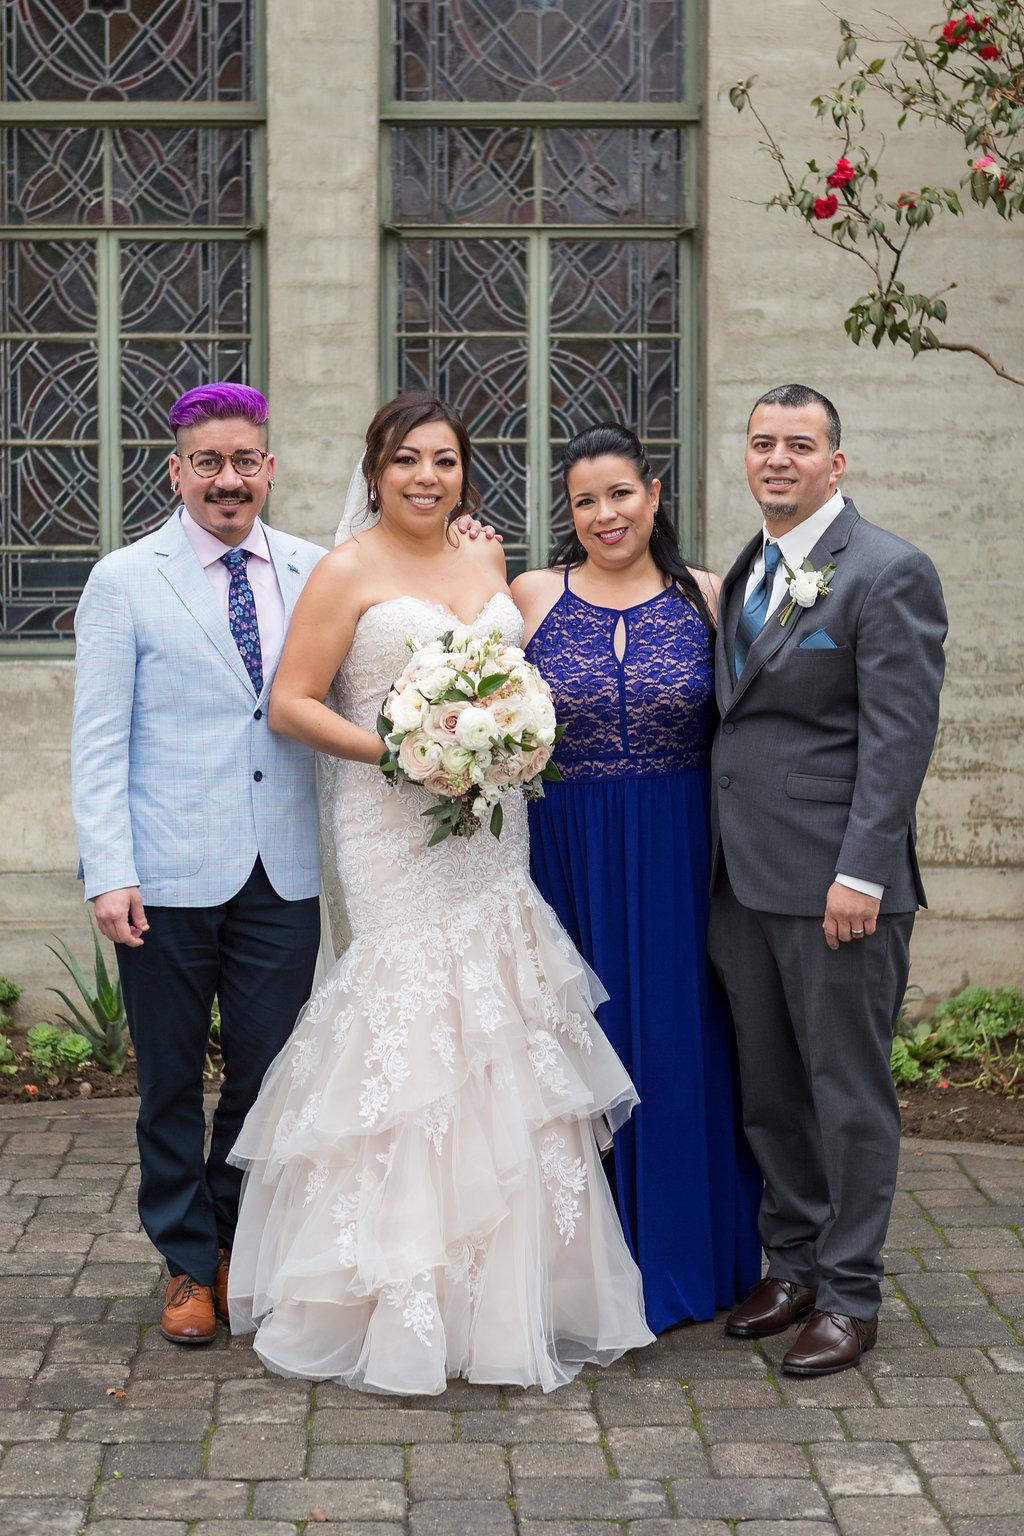 RanchoLasLomasWeddingPhotography-Claudia&Raul(141of338).jpg